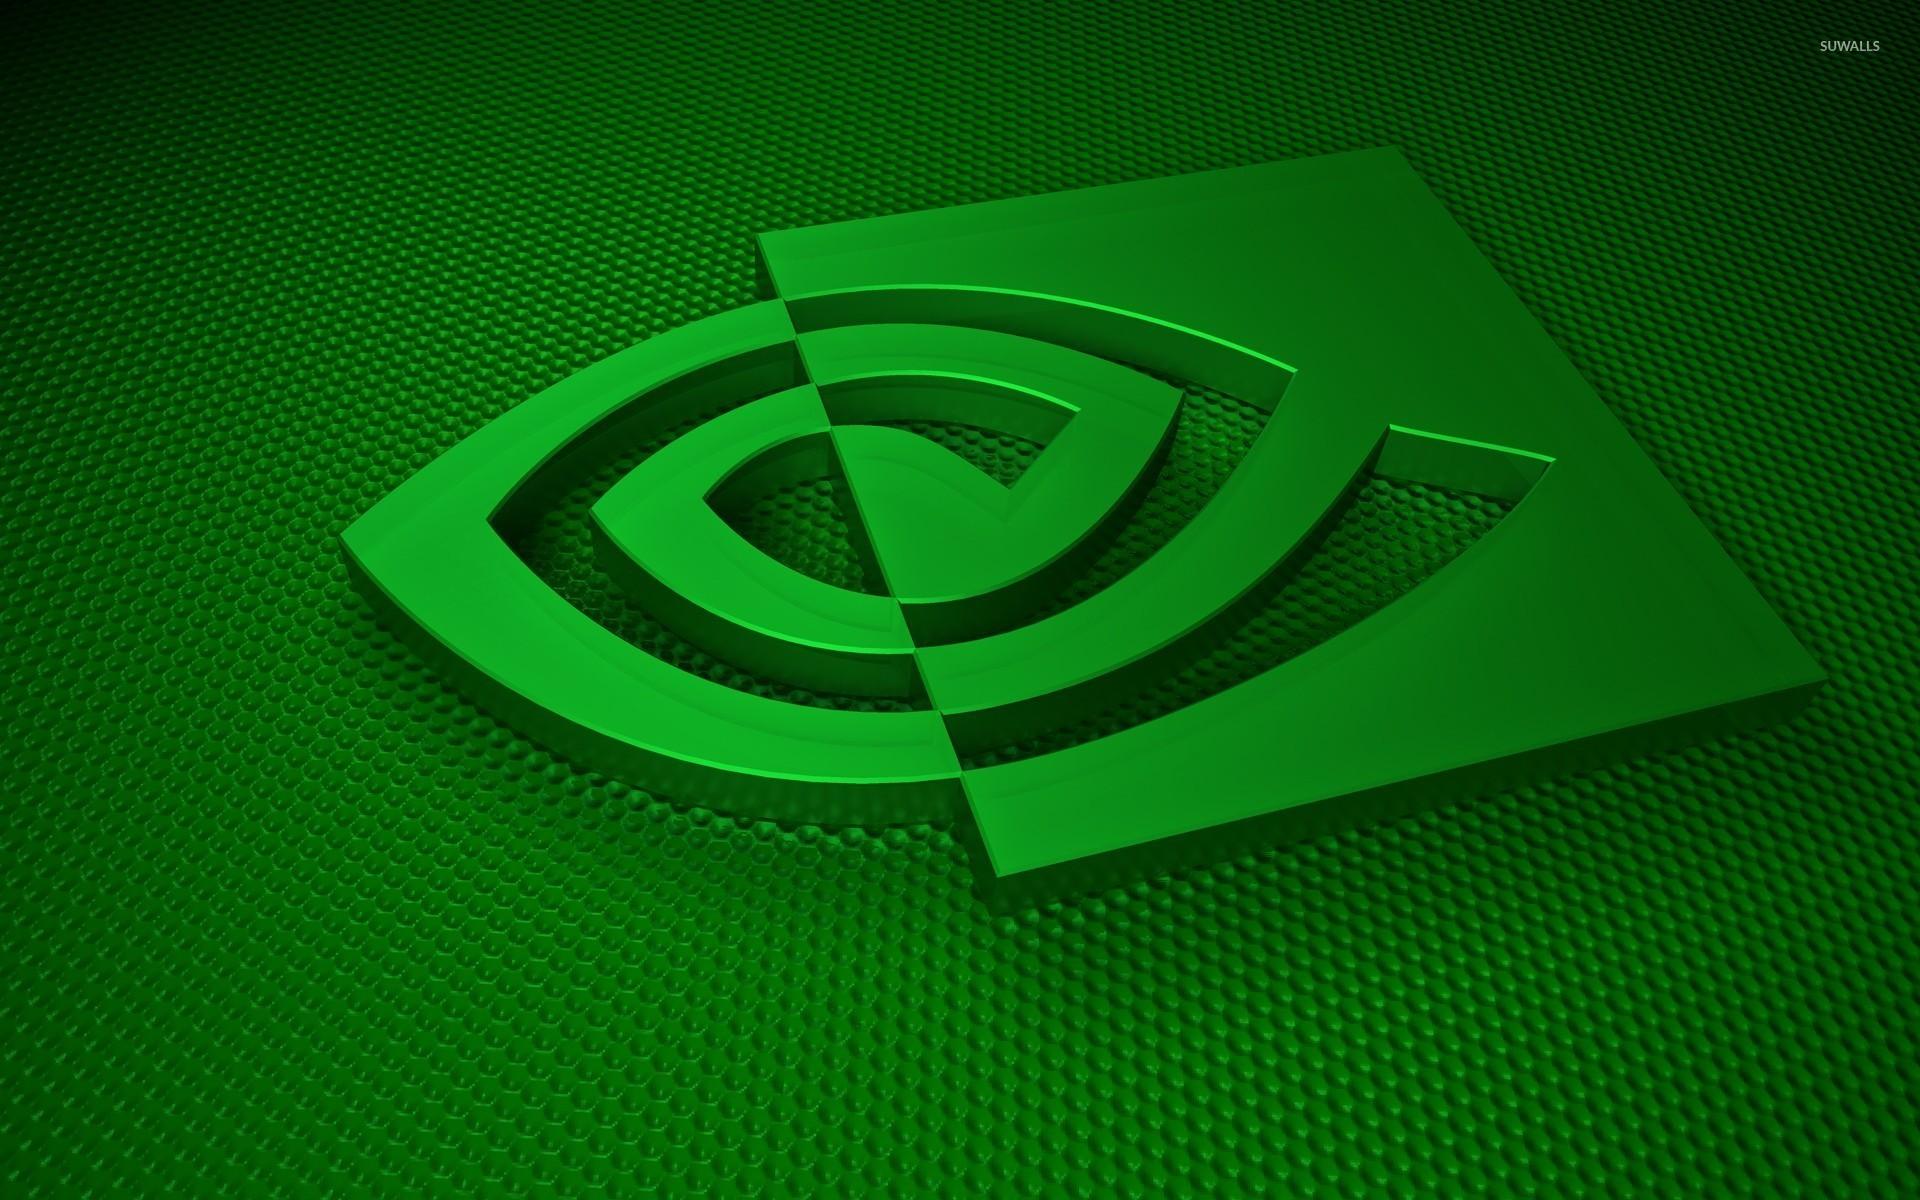 Evga Wallpapers Wallpaper 1920×1080 Nvidia Desktop Wallpapers (30 .